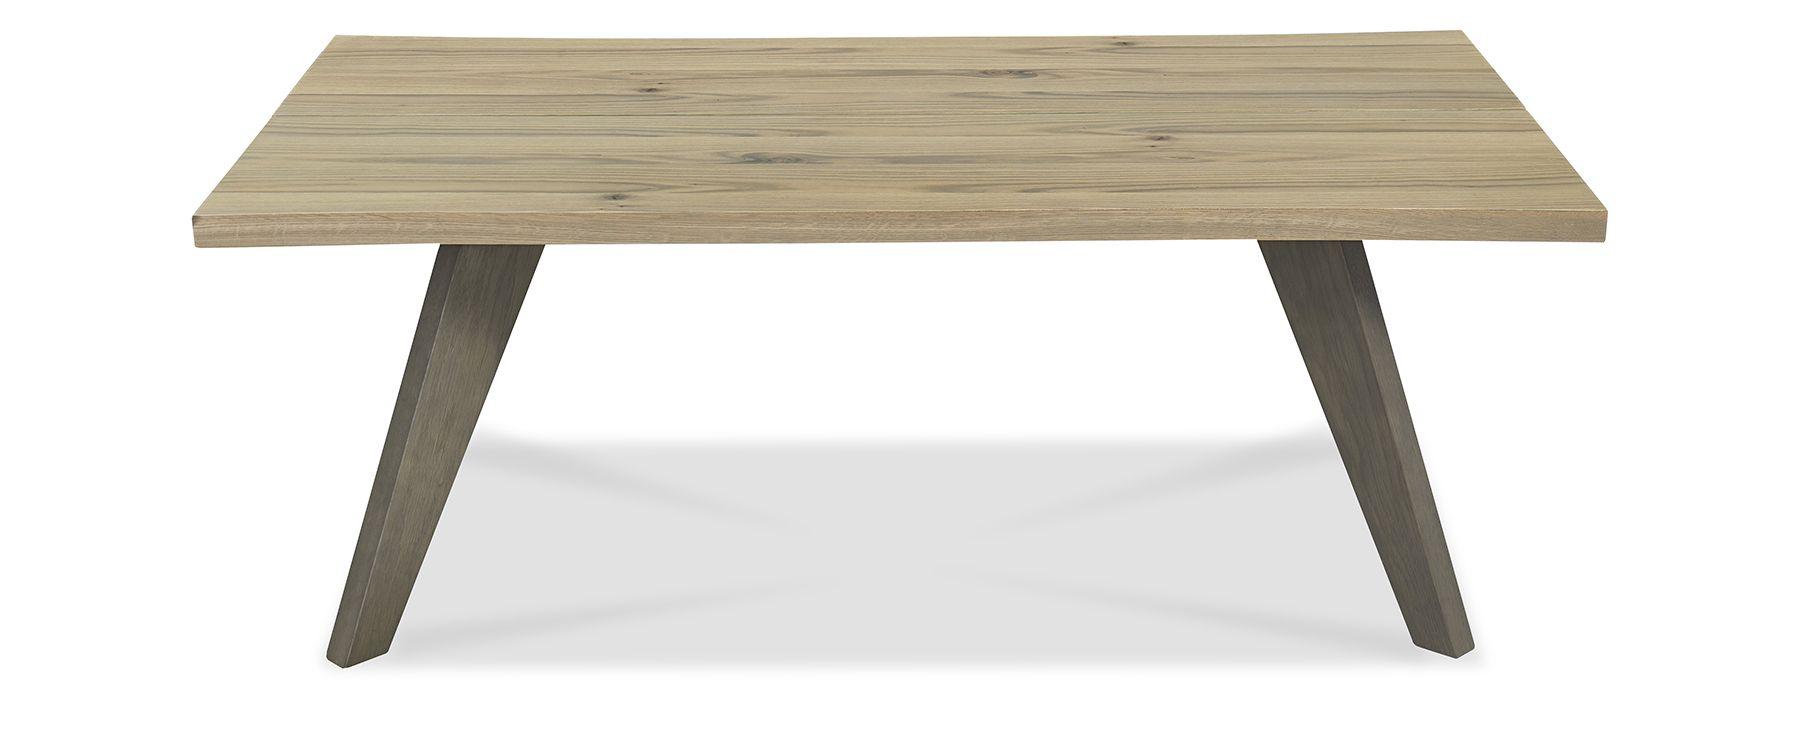 CARELL COFFEE TABLE - L121cm x D70cm xH40cm - FRONT DETAIL